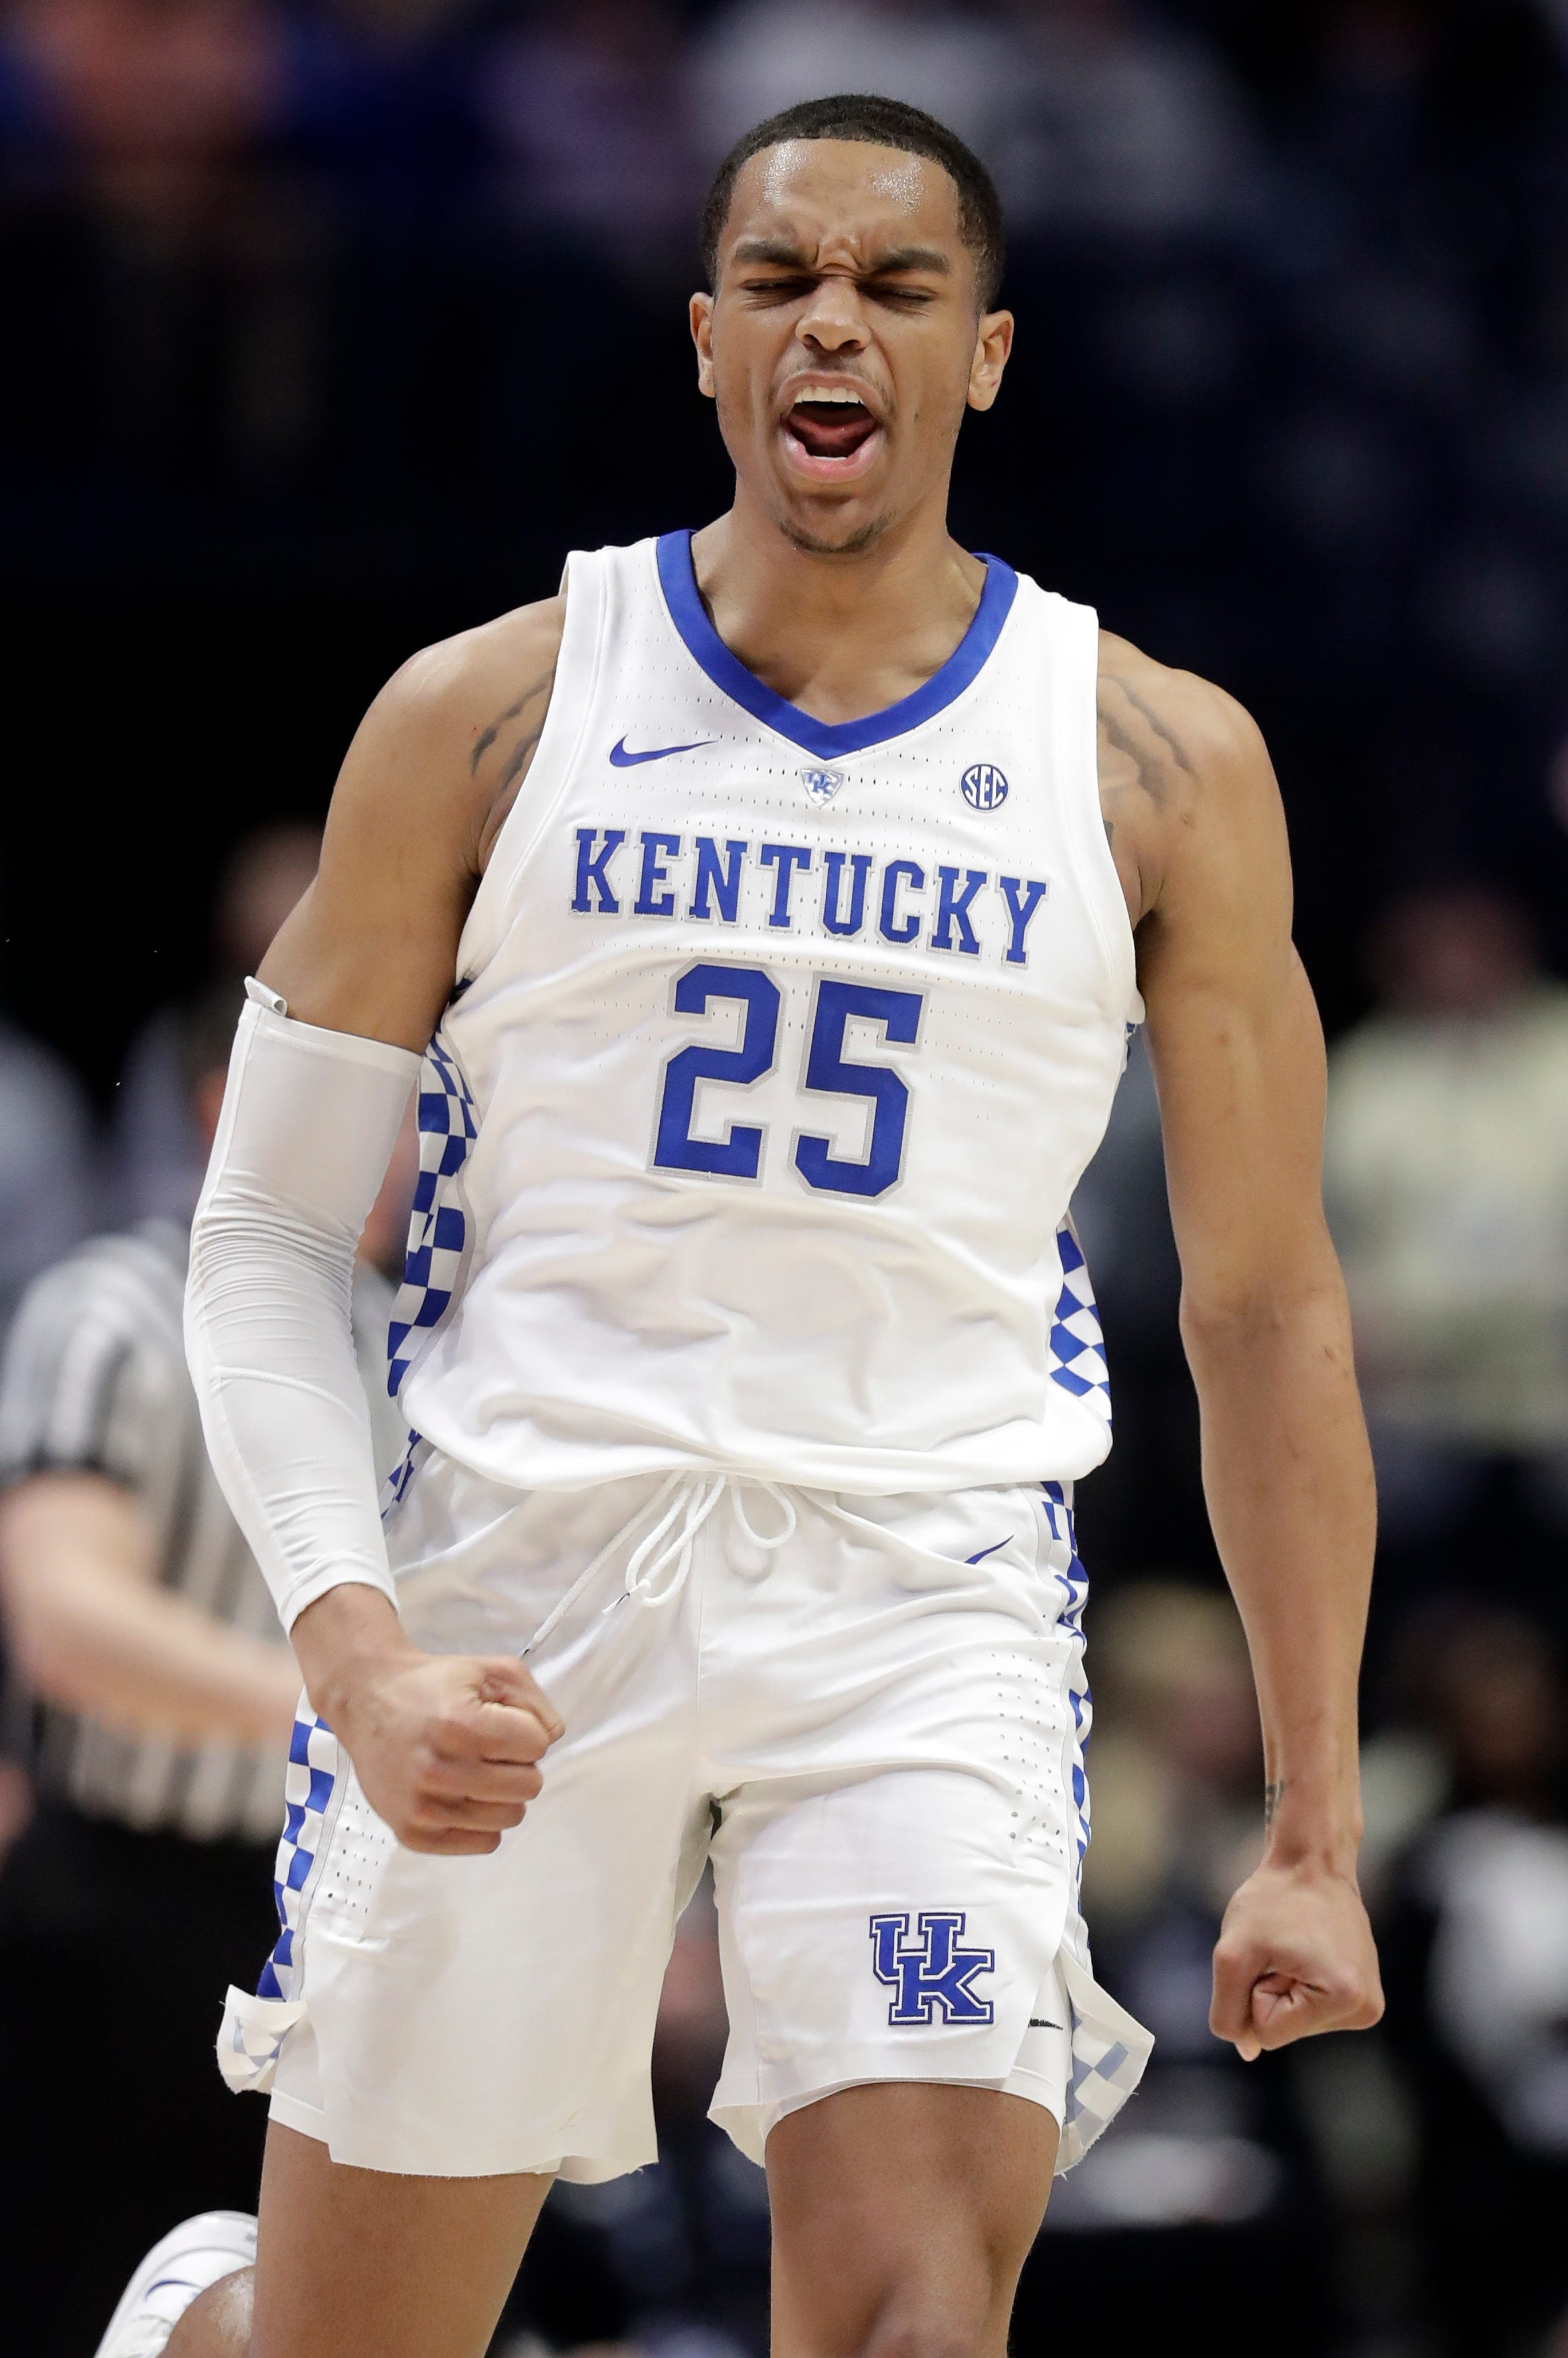 Kentucky's Calipari expects Washington to play in opener